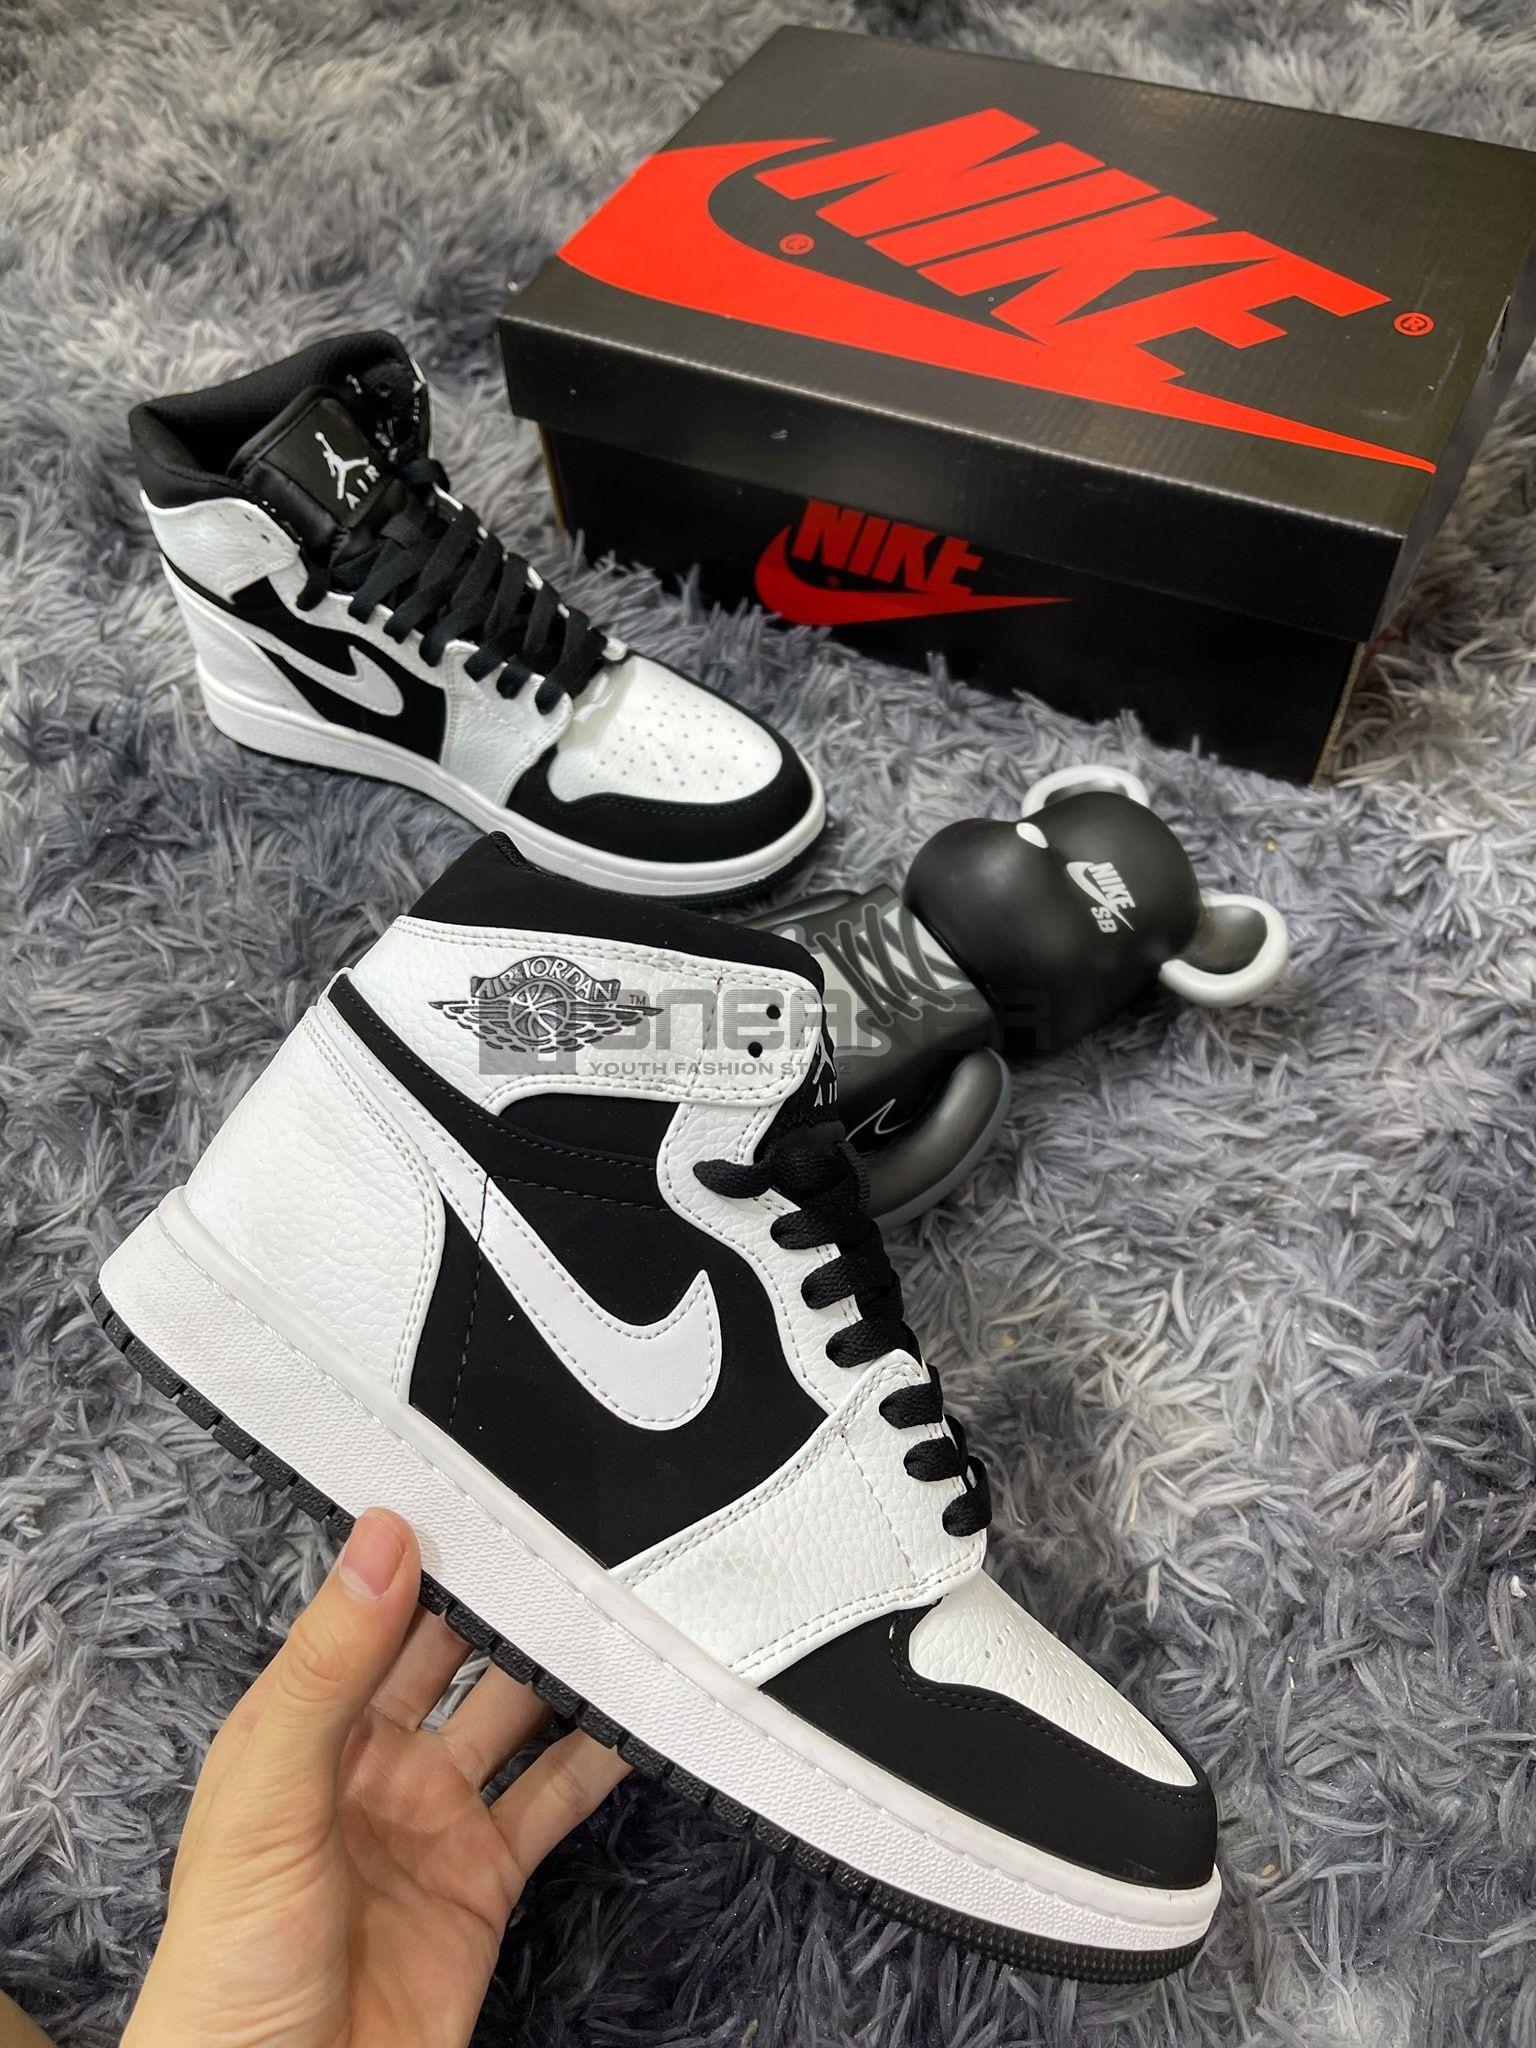 Nike Air Jordan1 Trắng Đen Cổ Cao